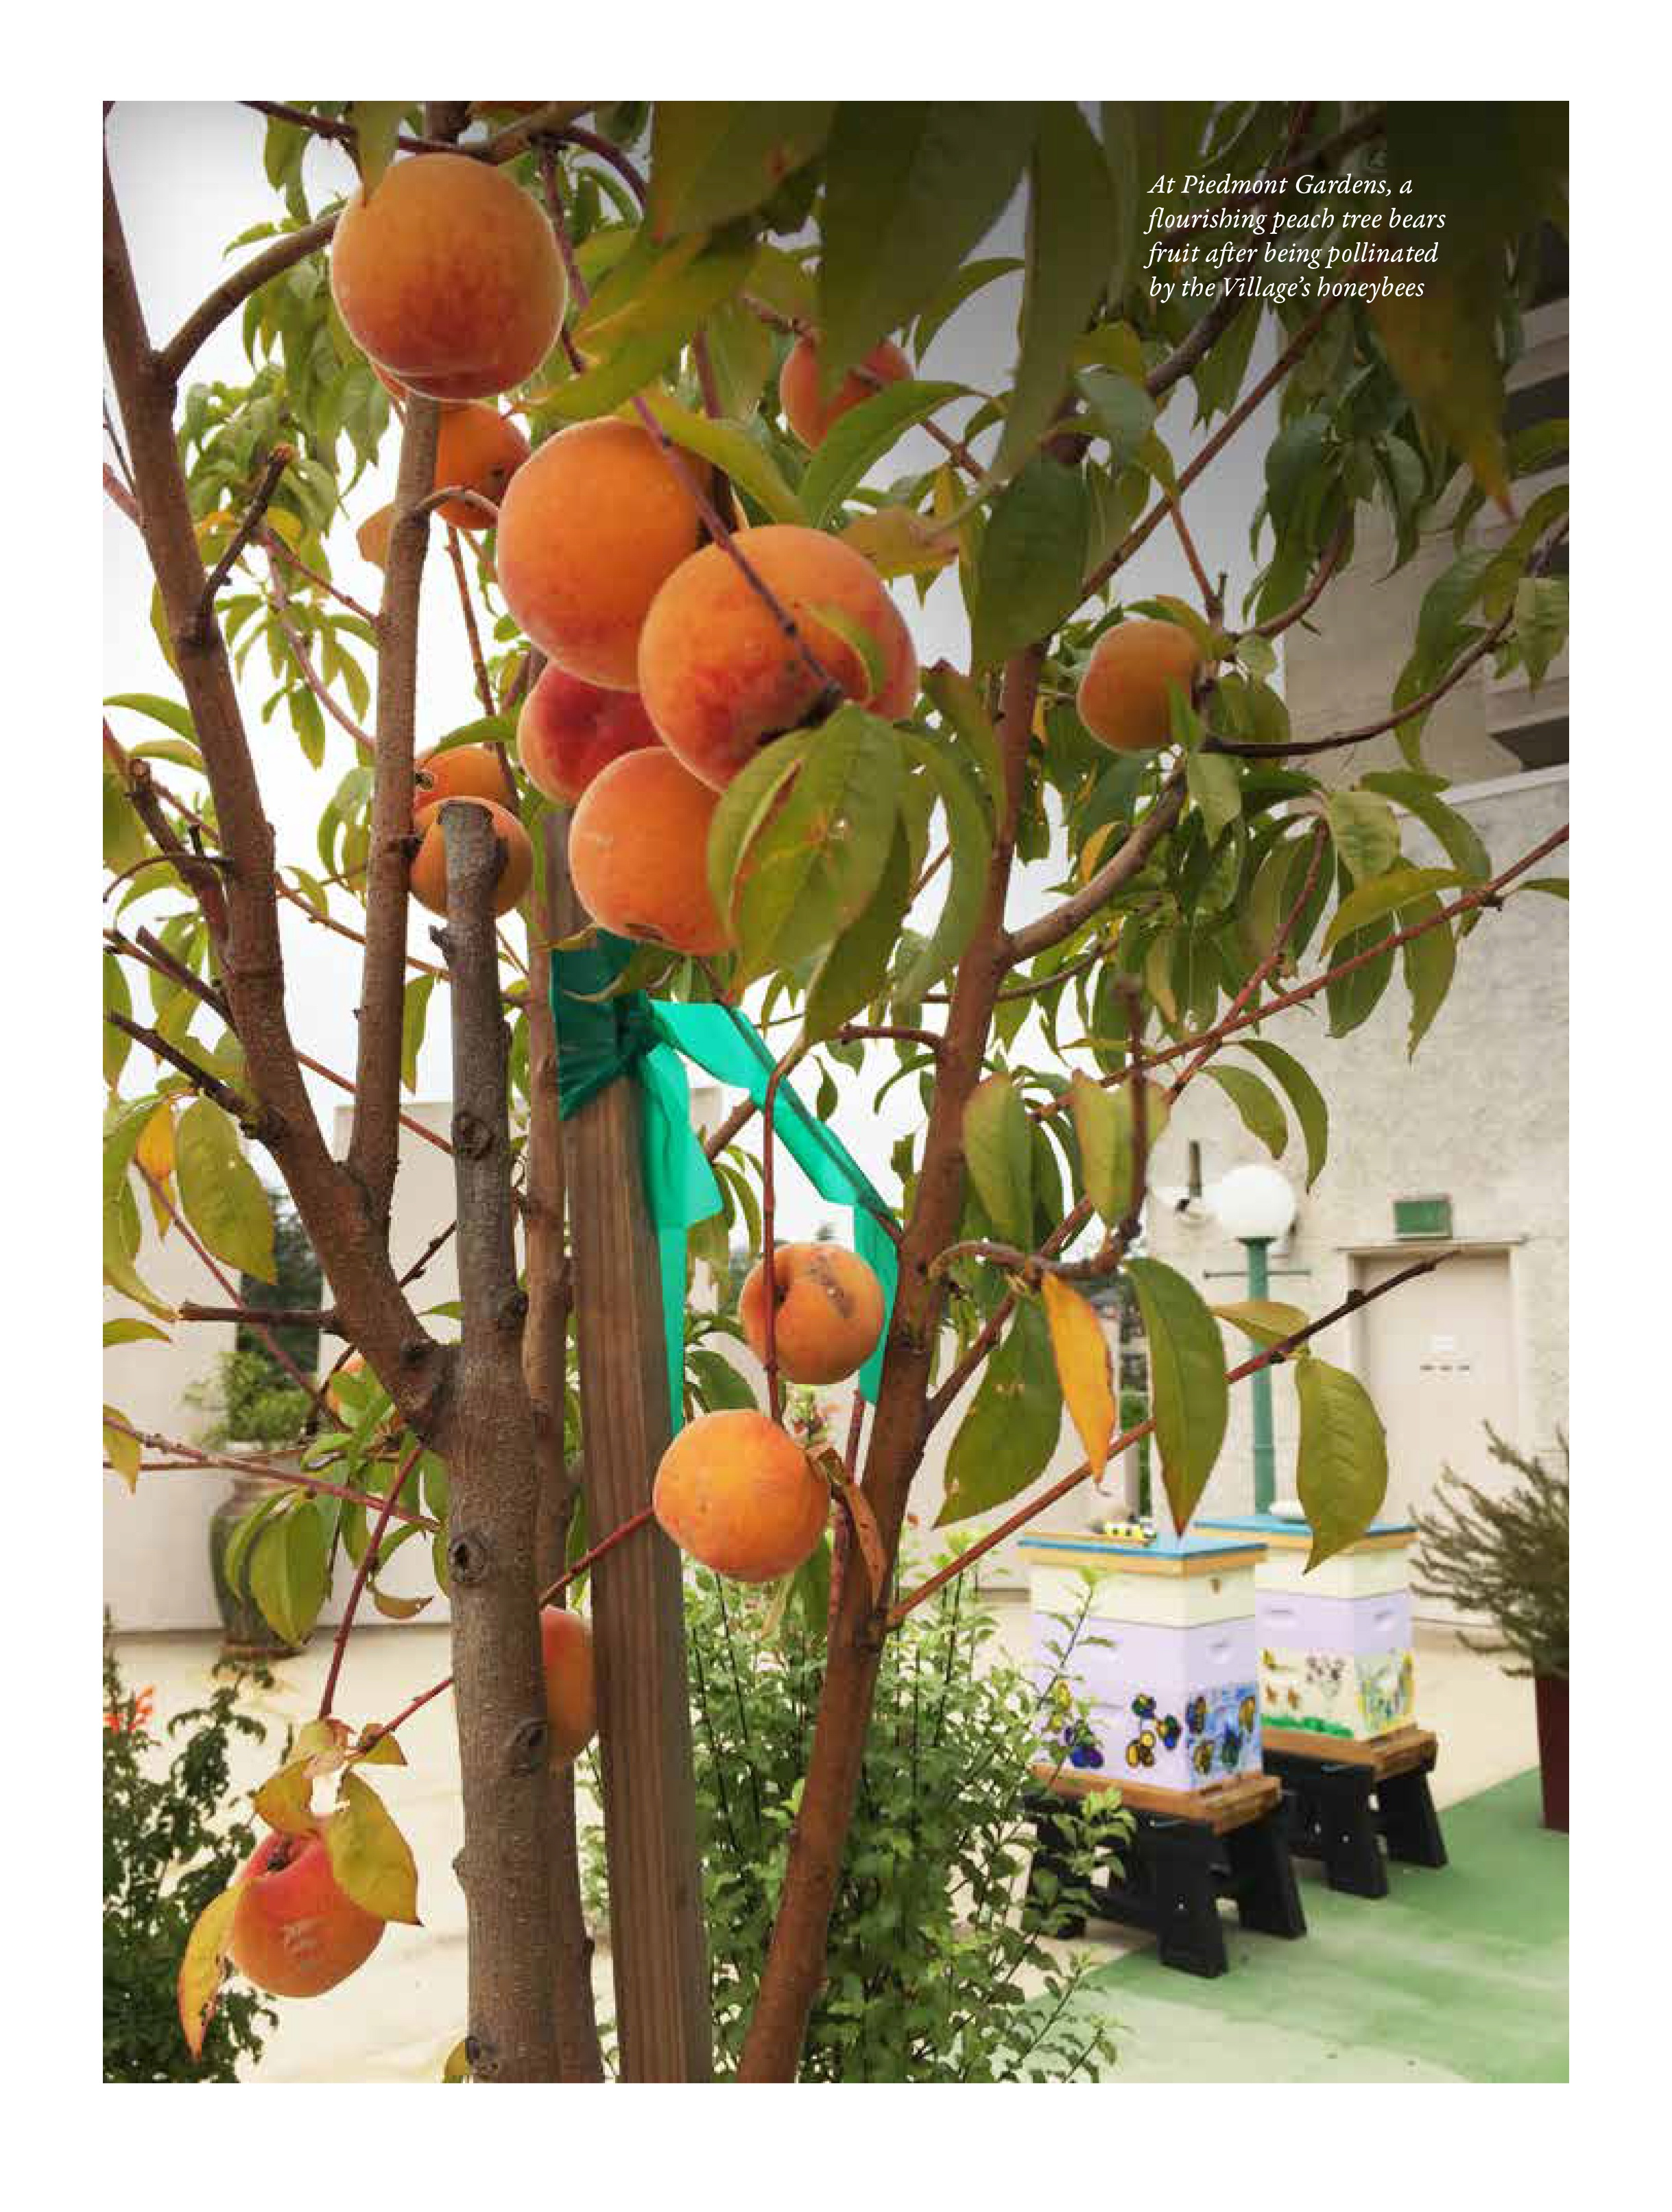 Innovators-Piedmont Gardens-low res-2.jpg